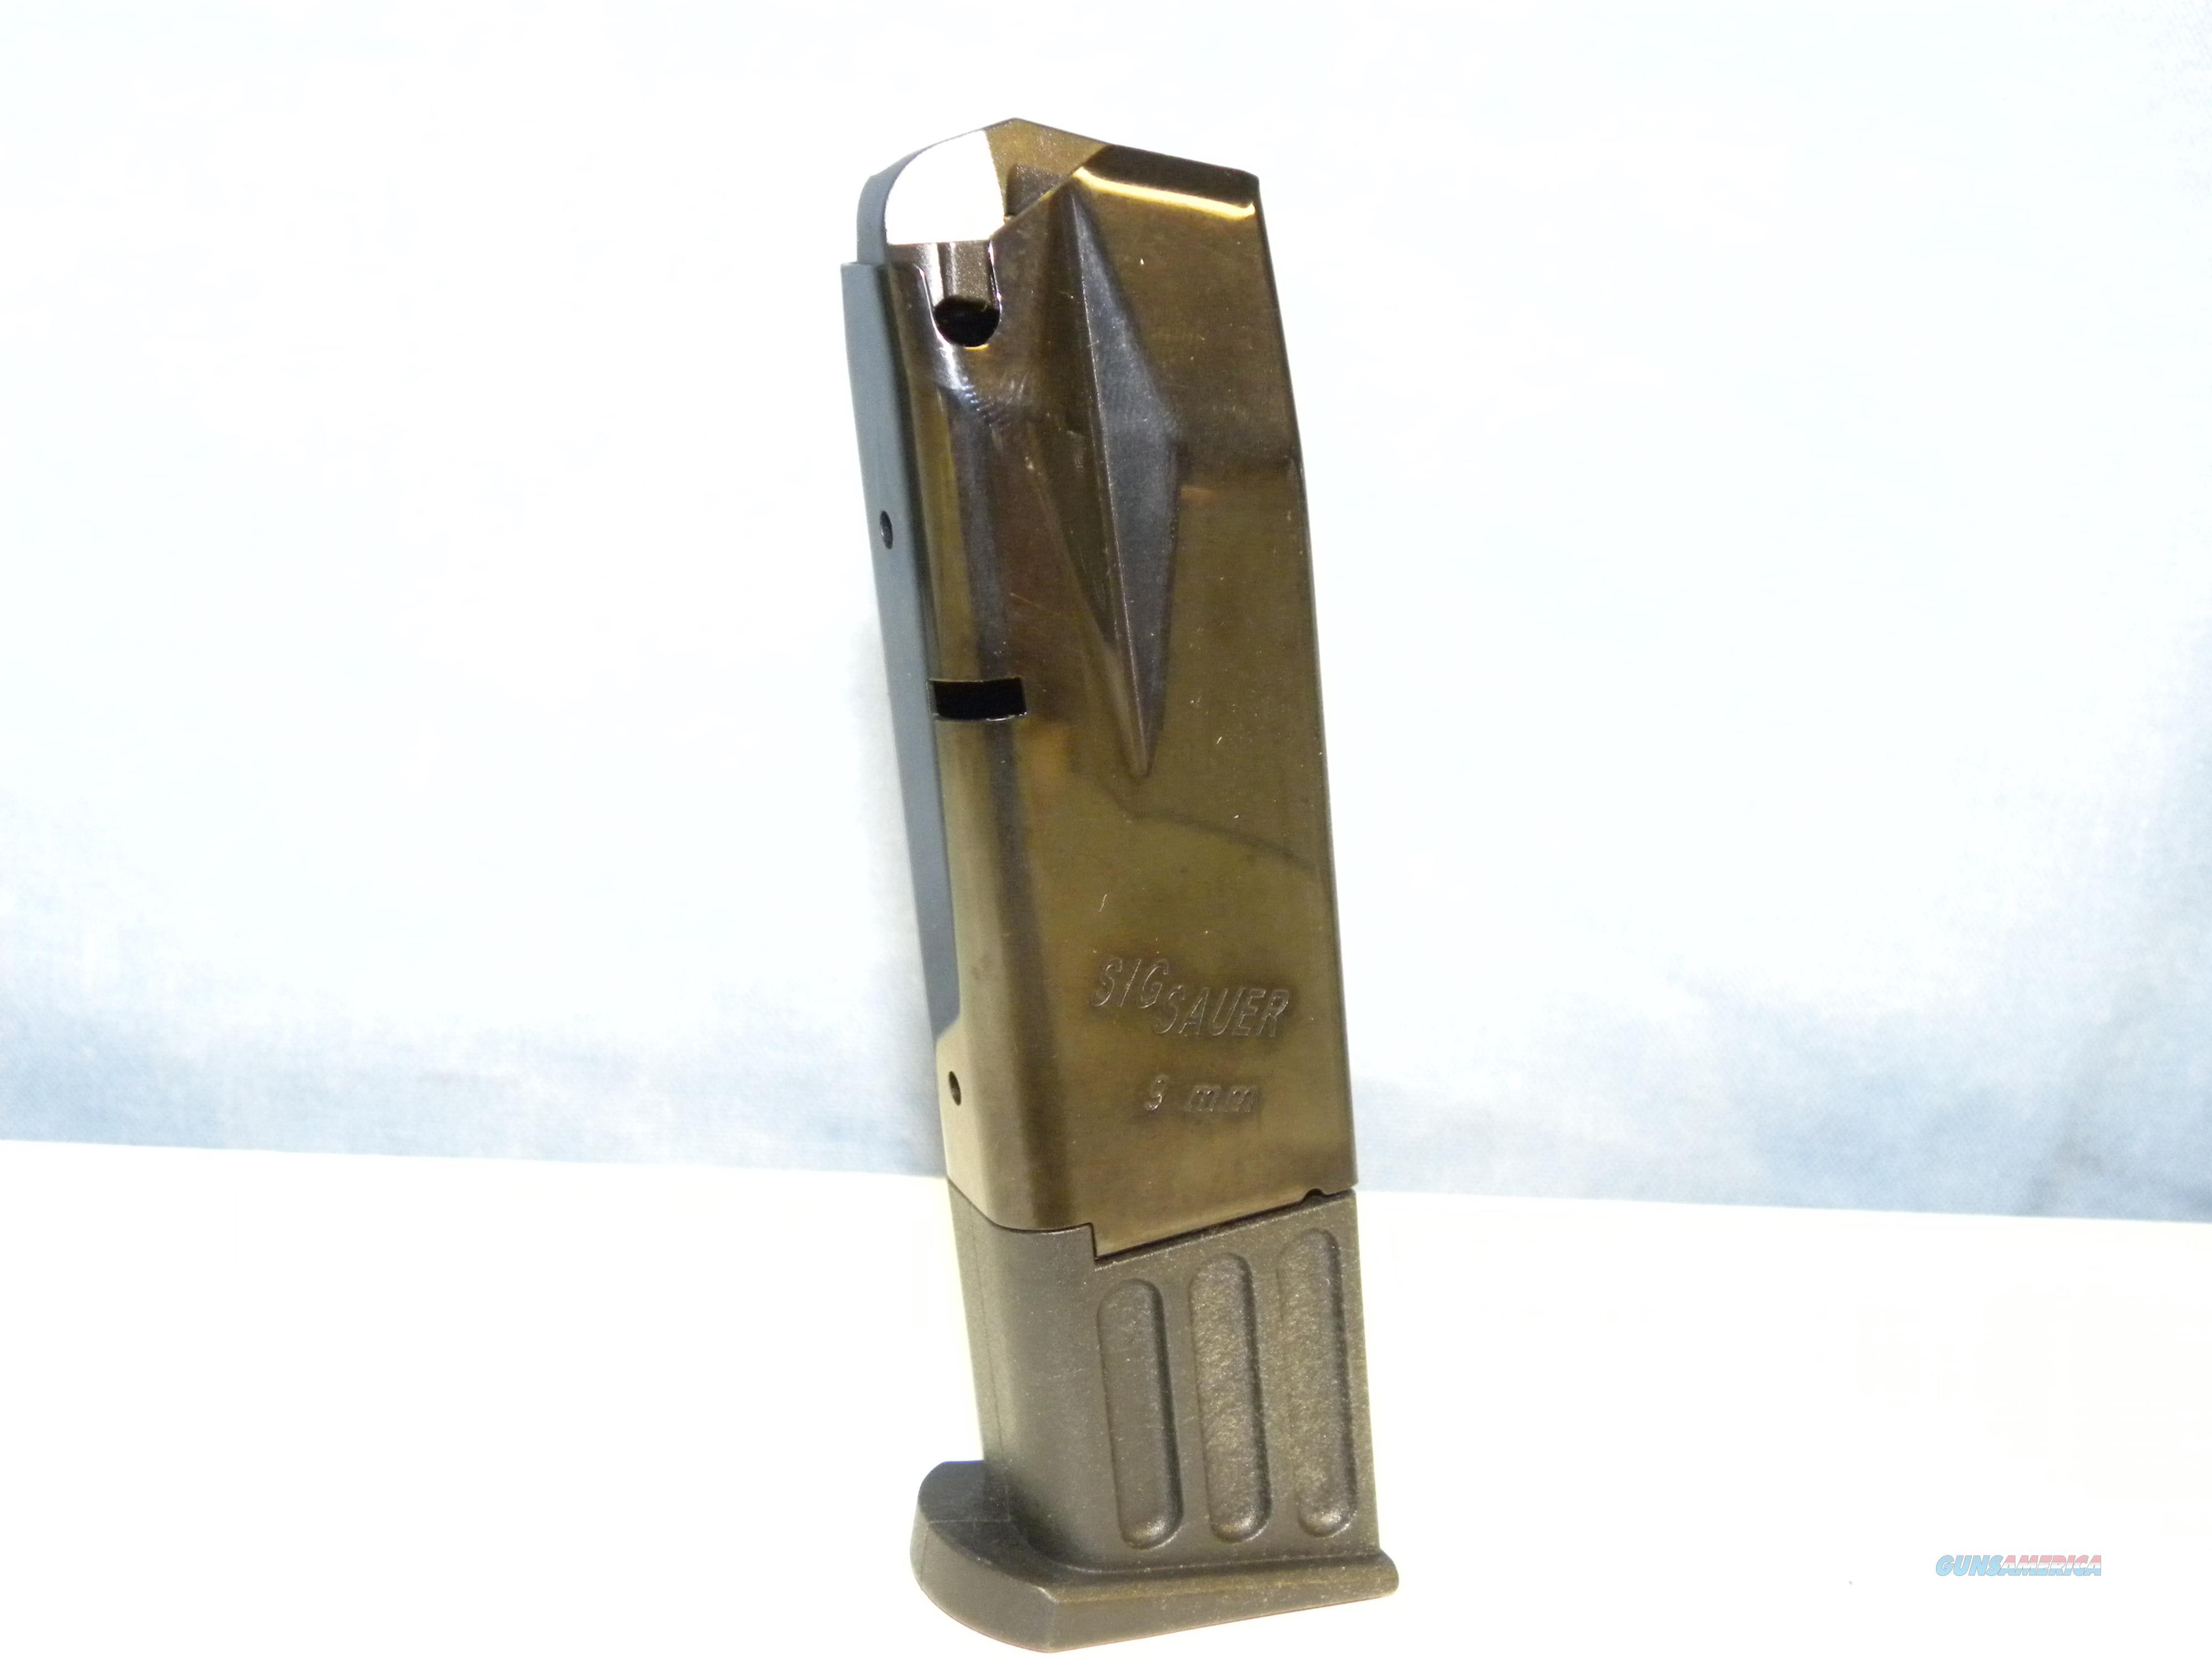 Sig Sauer 226 9mm Magazine 10 RD New No Box  Non-Guns > Magazines & Clips > Pistol Magazines > Sig